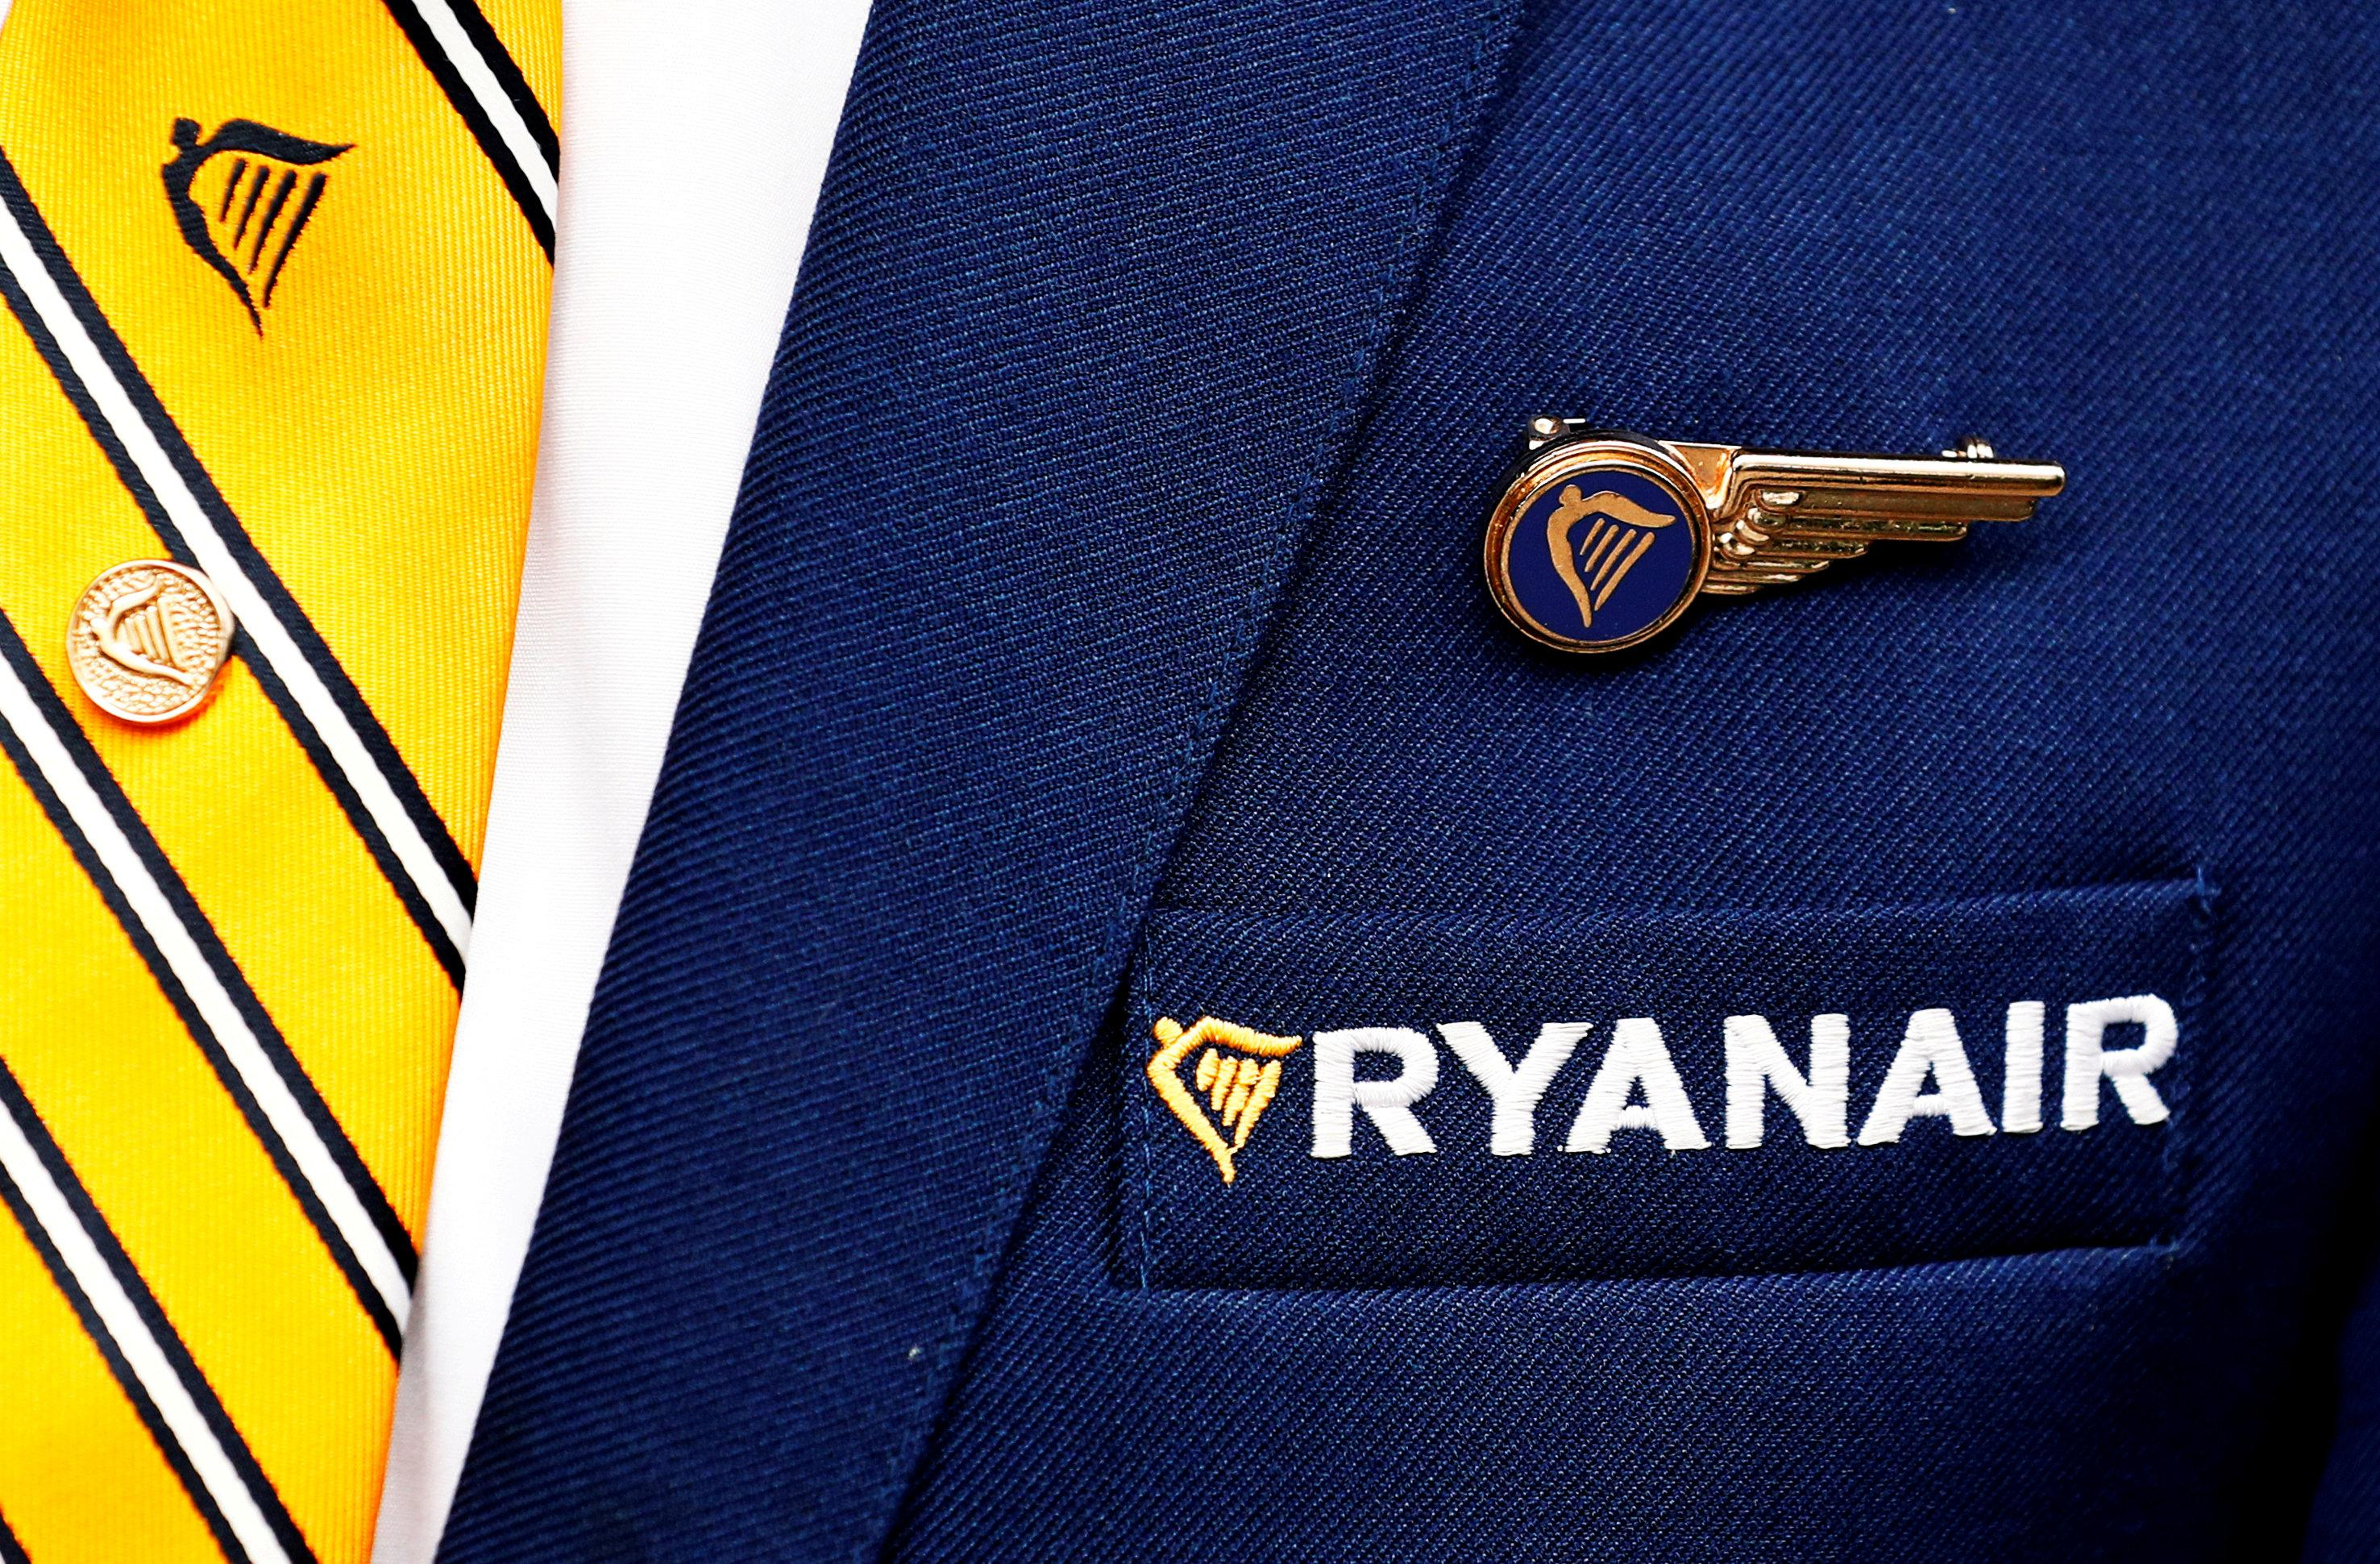 EU pilot group demands Ryanair reverse 'aggressive' base closures